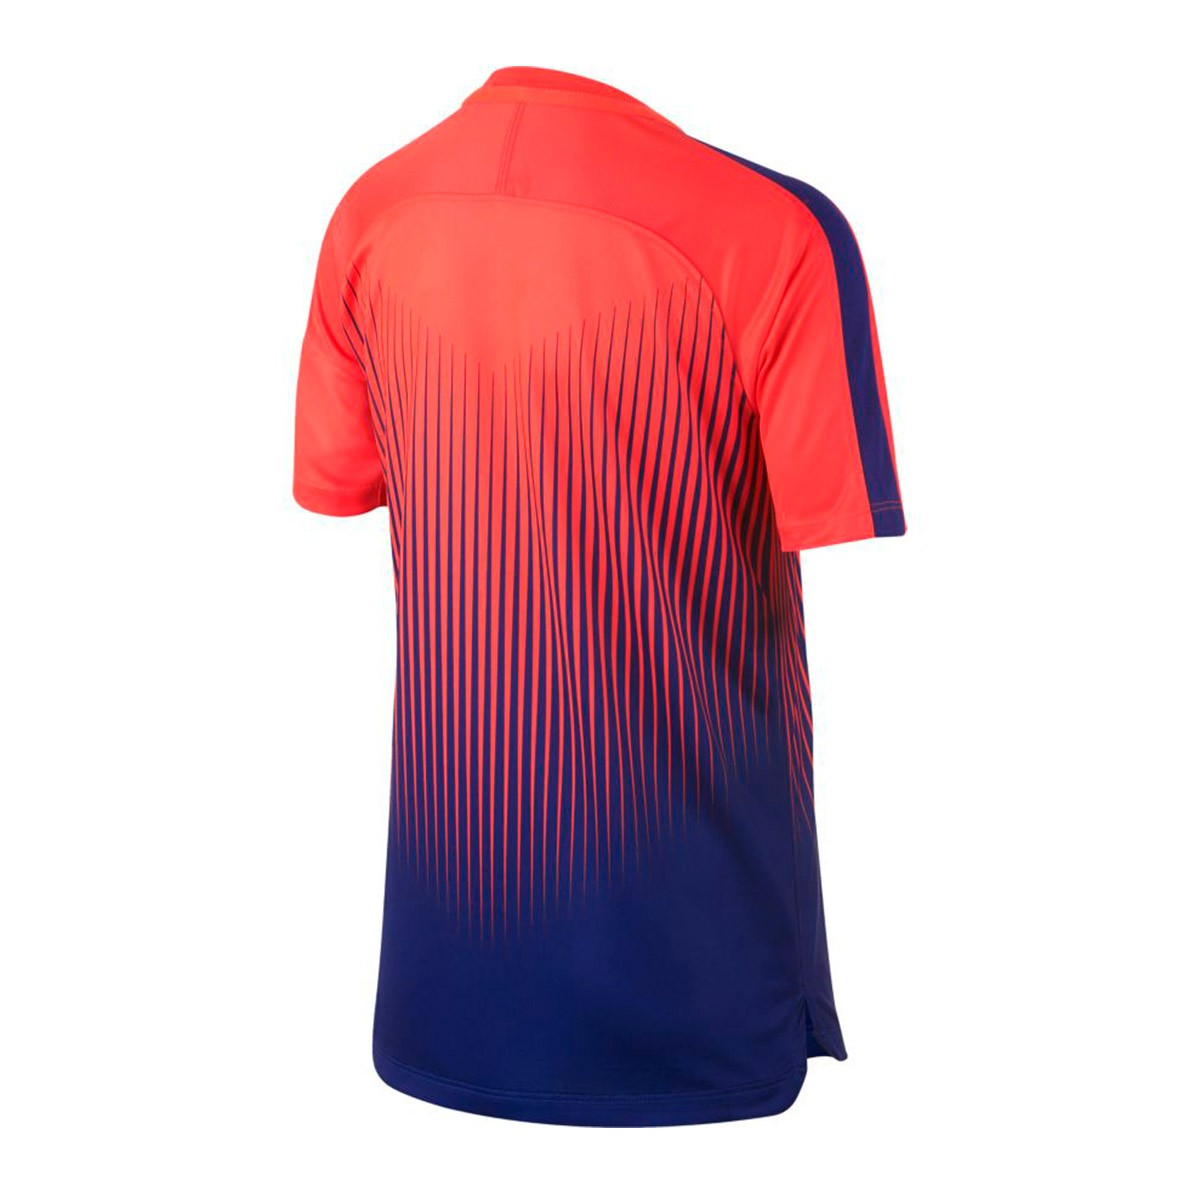 c68adf311d37a Camiseta Nike Atlético de Madrid Squad SS GX 2018-2019 Niño Bright  crimson-Deep royal blue - Tienda de fútbol Fútbol Emotion